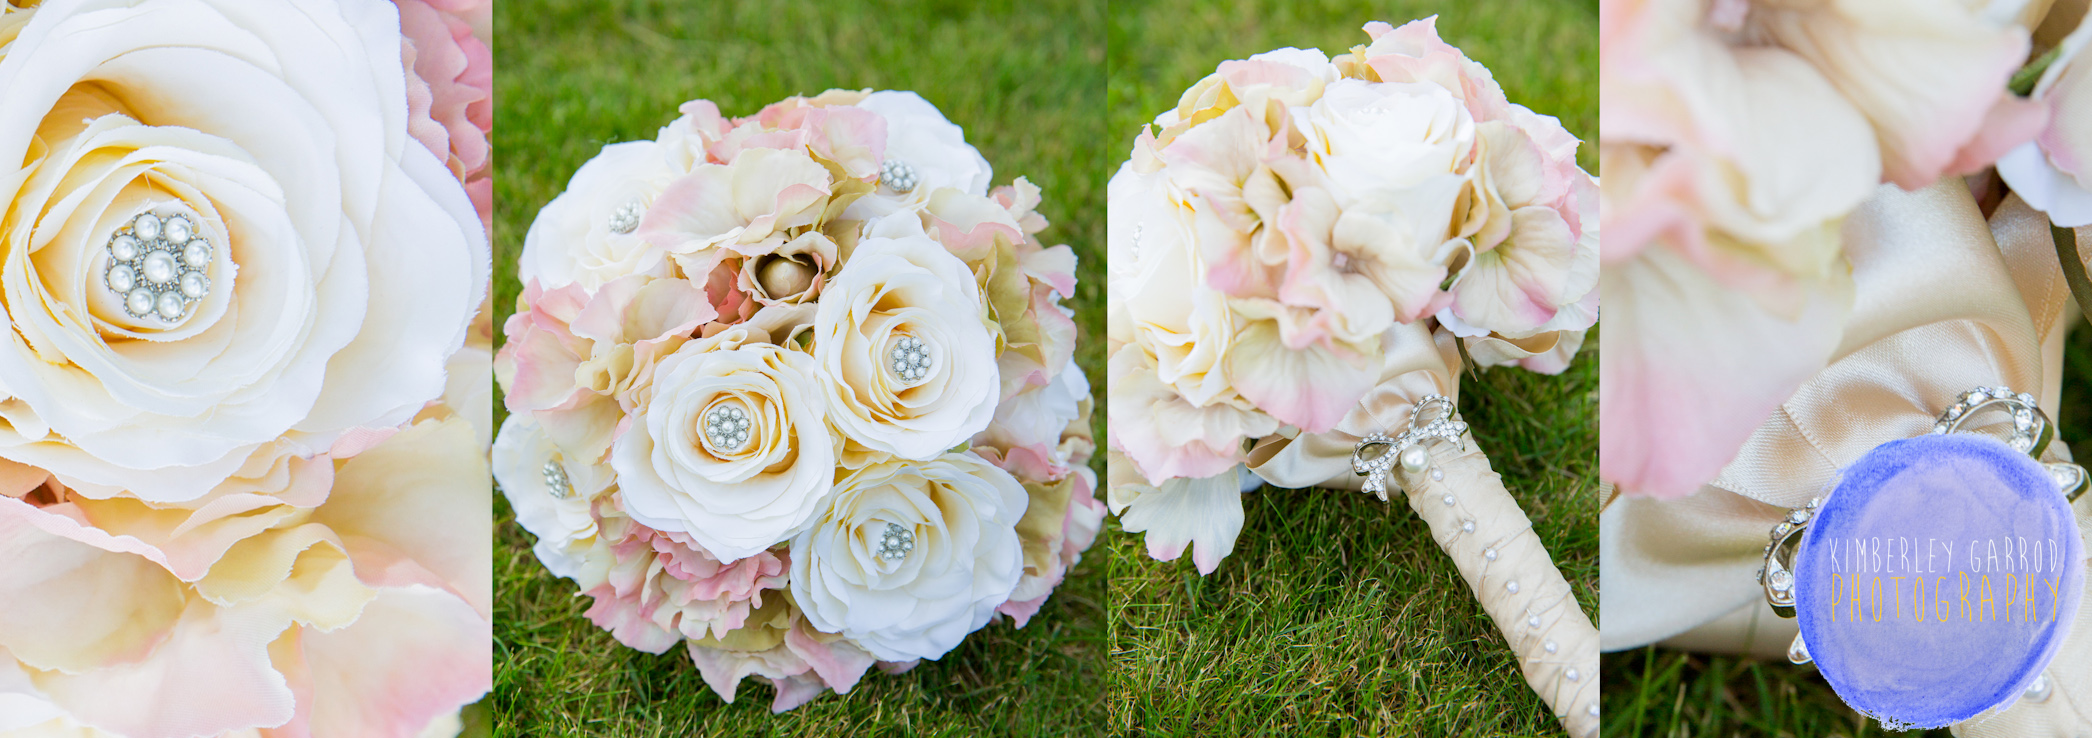 Luv Flowers  Kimberley Garrod Photography